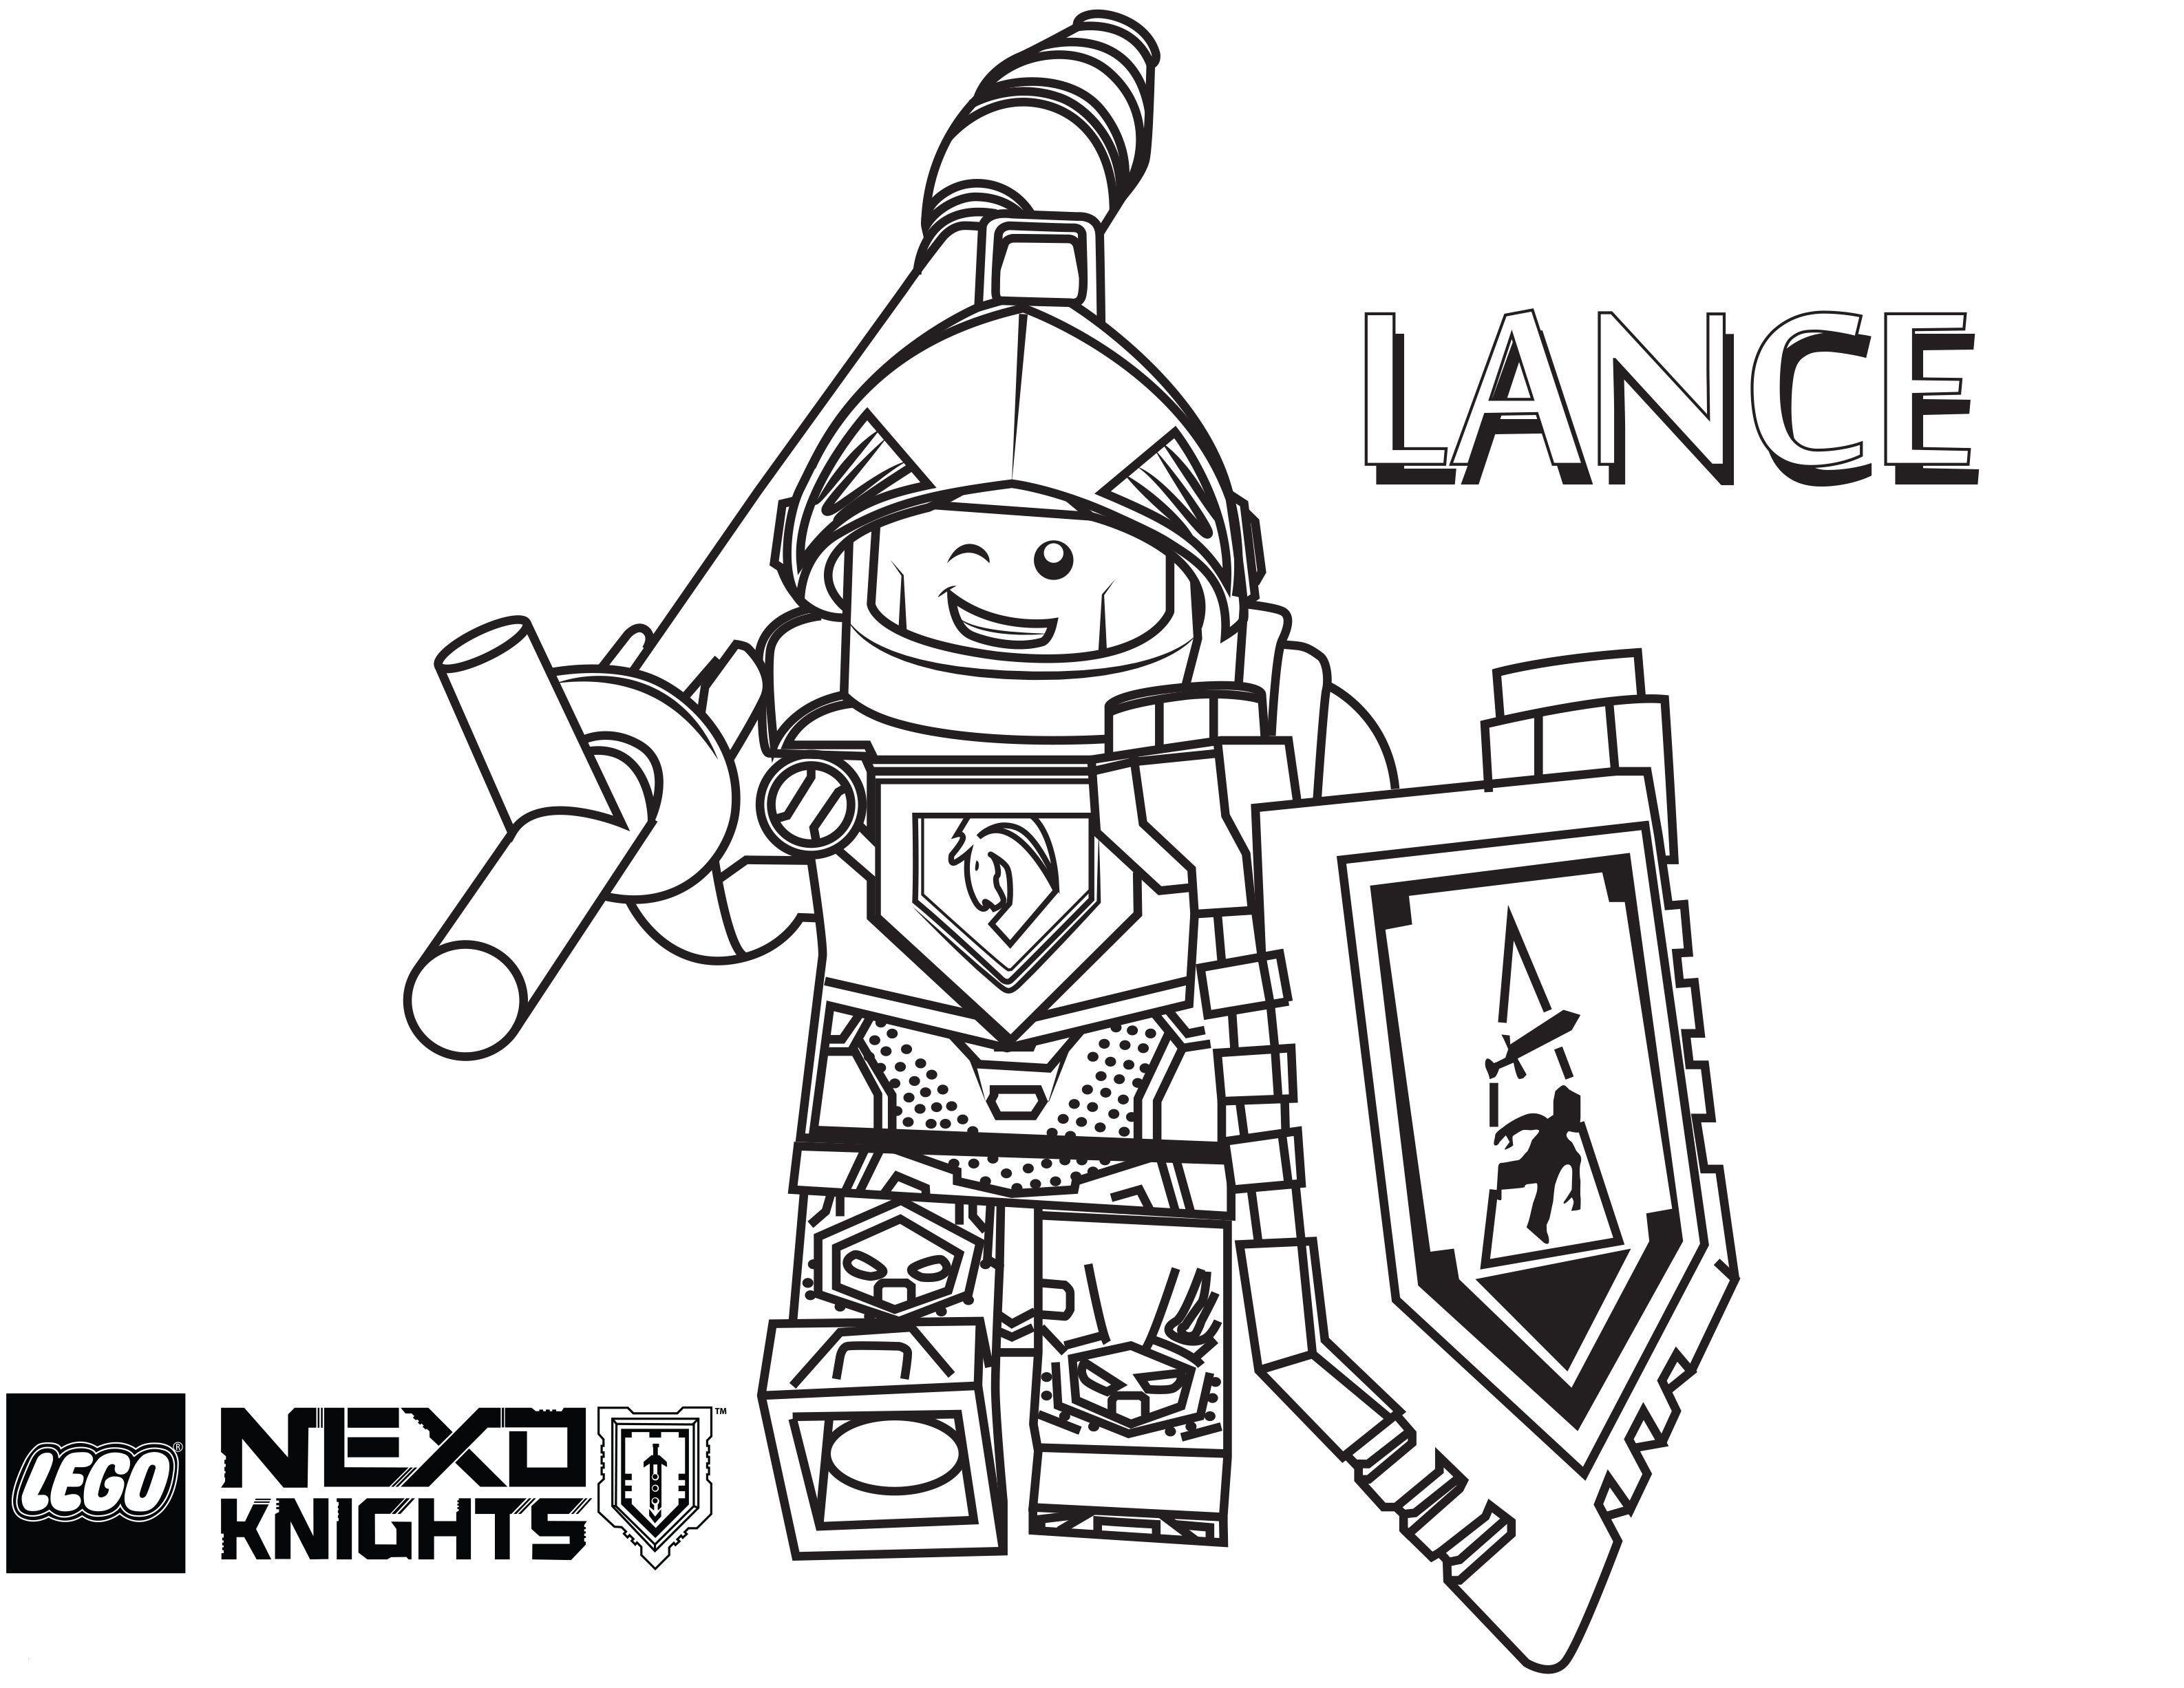 Ausmalbild Nexo Knights Einzigartig Ausmalbilder Lego Nexo Knights élégant Image Ausmalbilder Lego Nexo Fotos